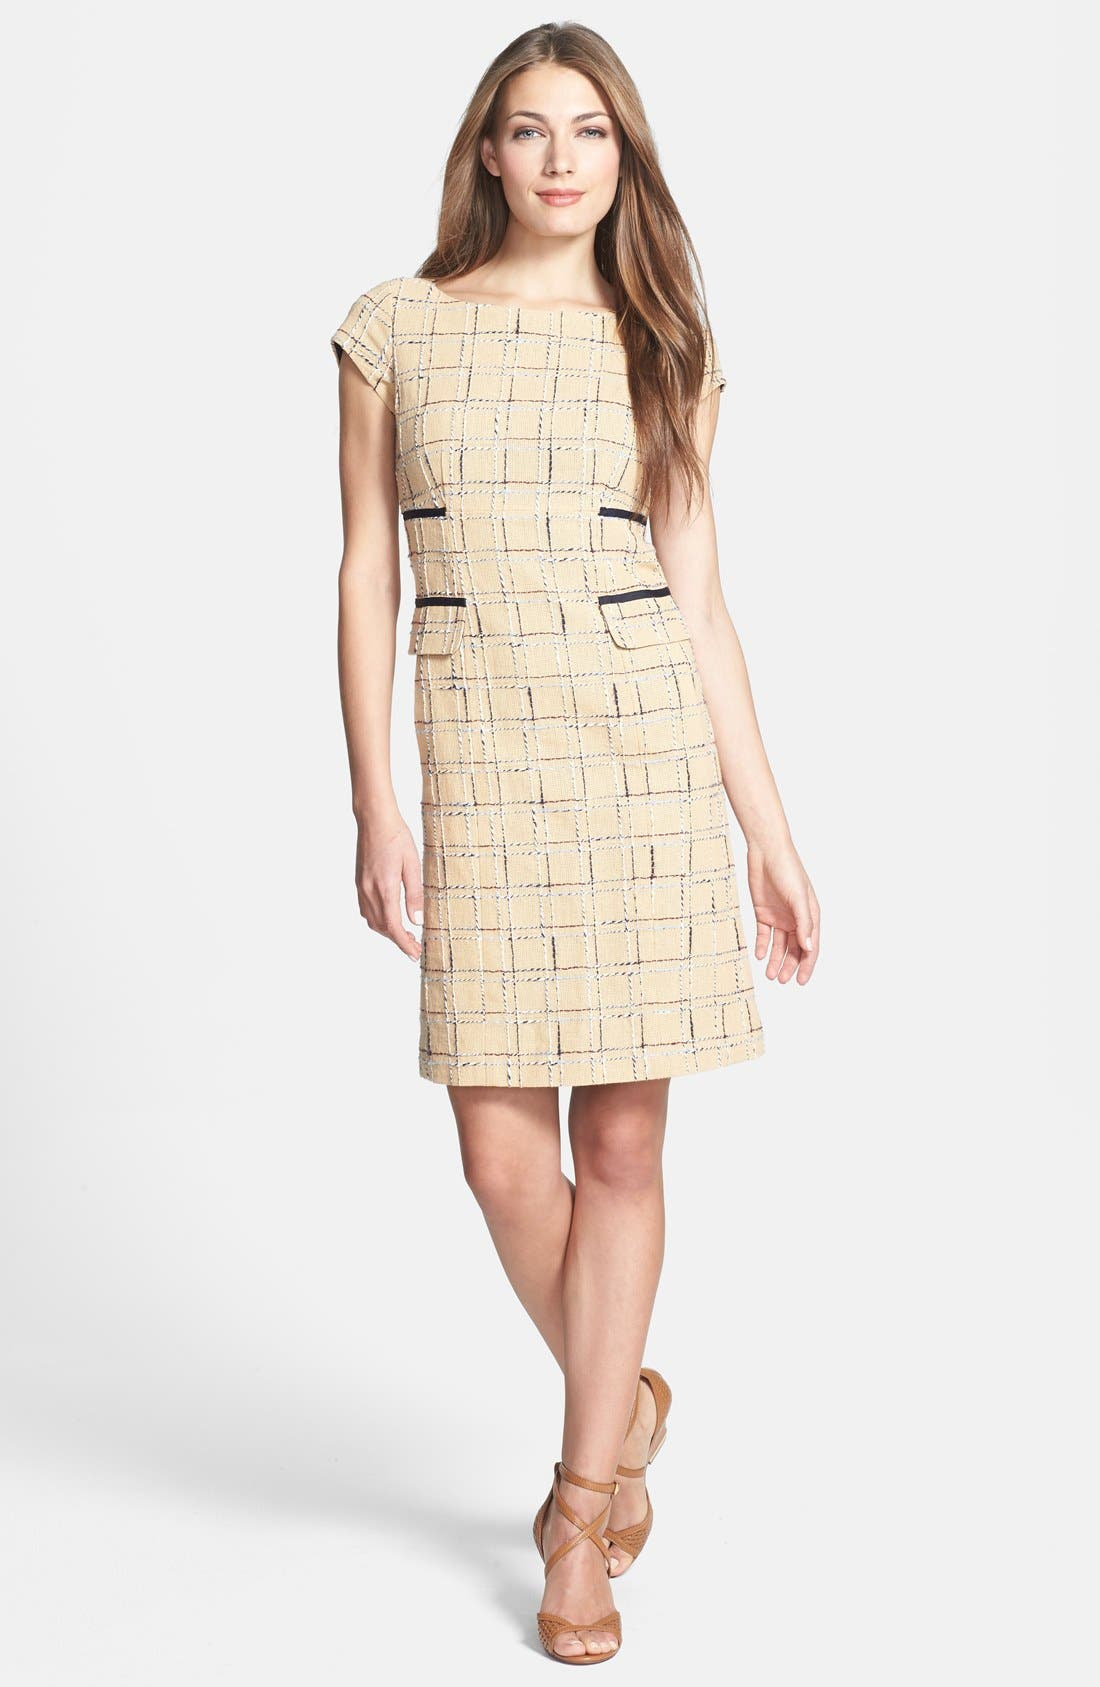 Alternate Image 1 Selected - Tory Burch 'Evie' Woven Cotton & Linen Sheath Dress